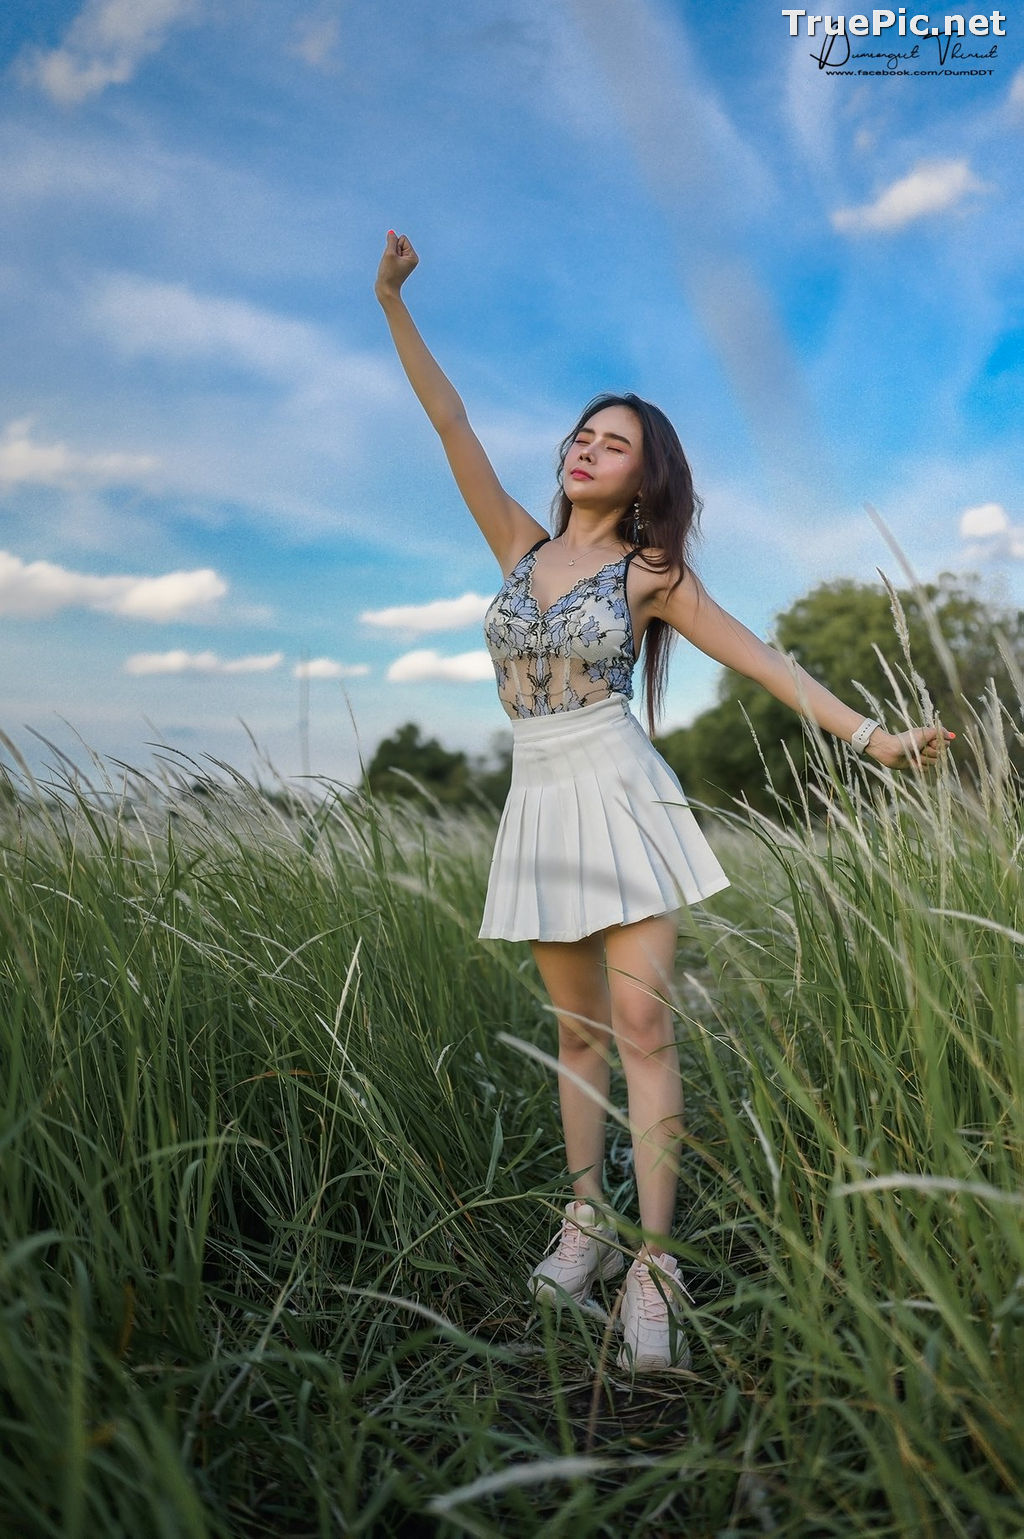 Image Thailand Model - Anusara Thaweesuk - Wild Grass Field - TruePic.net - Picture-10